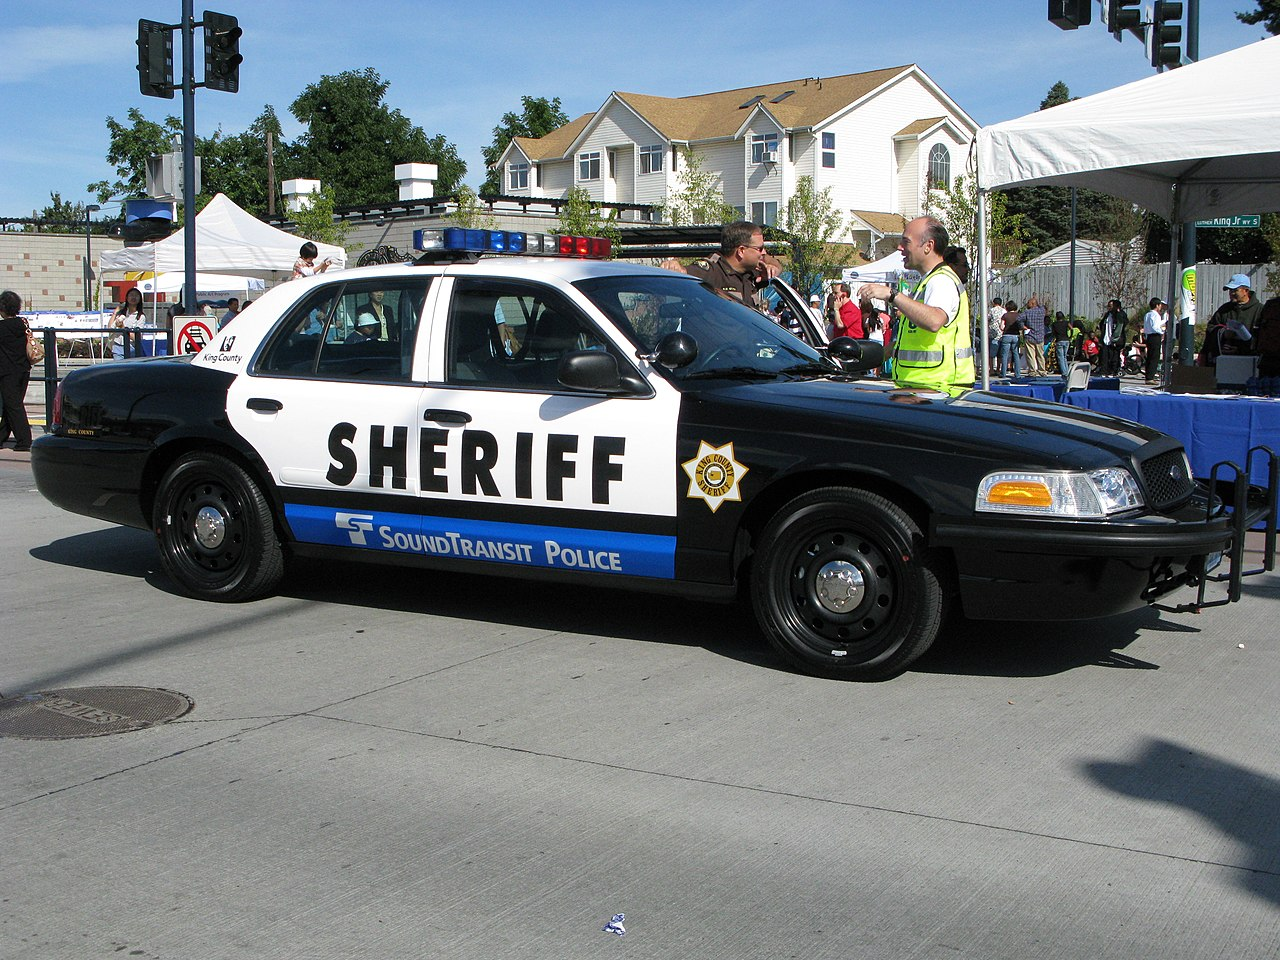 Miami Chevrolet Car Dealer   Off On Cars